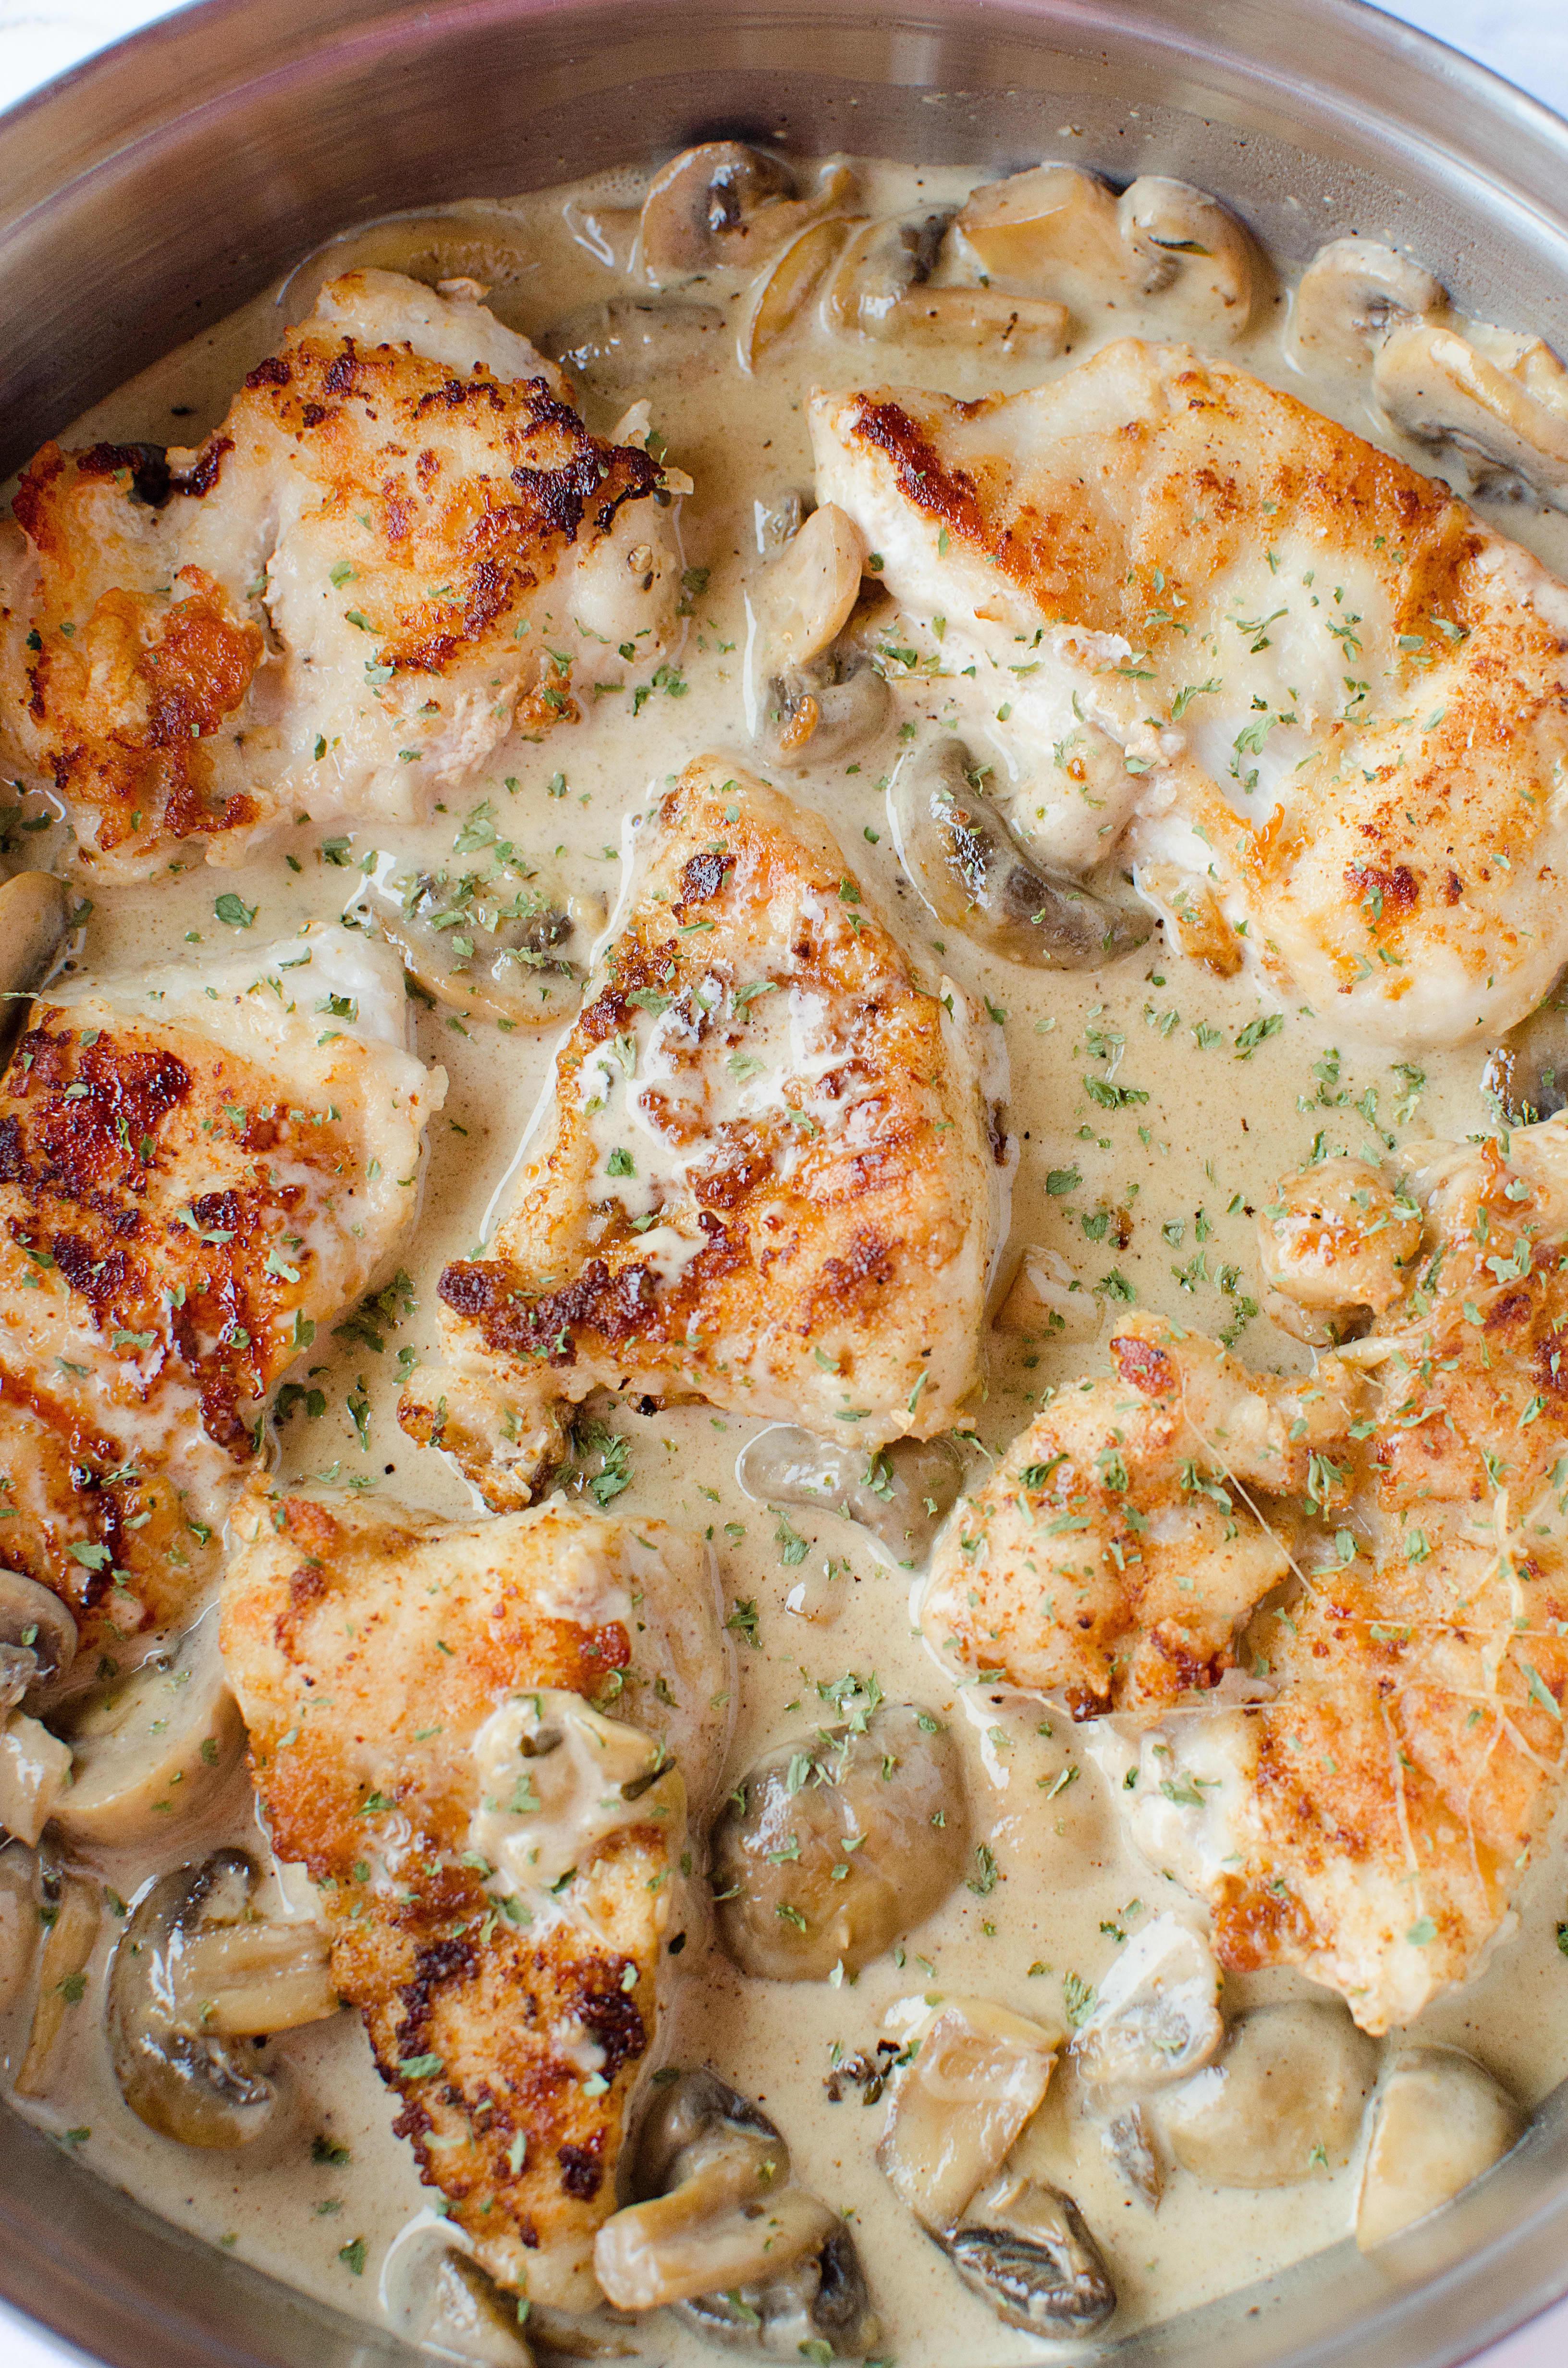 This Creamy Mushroom Asiago Chicken Is a Masterpiece